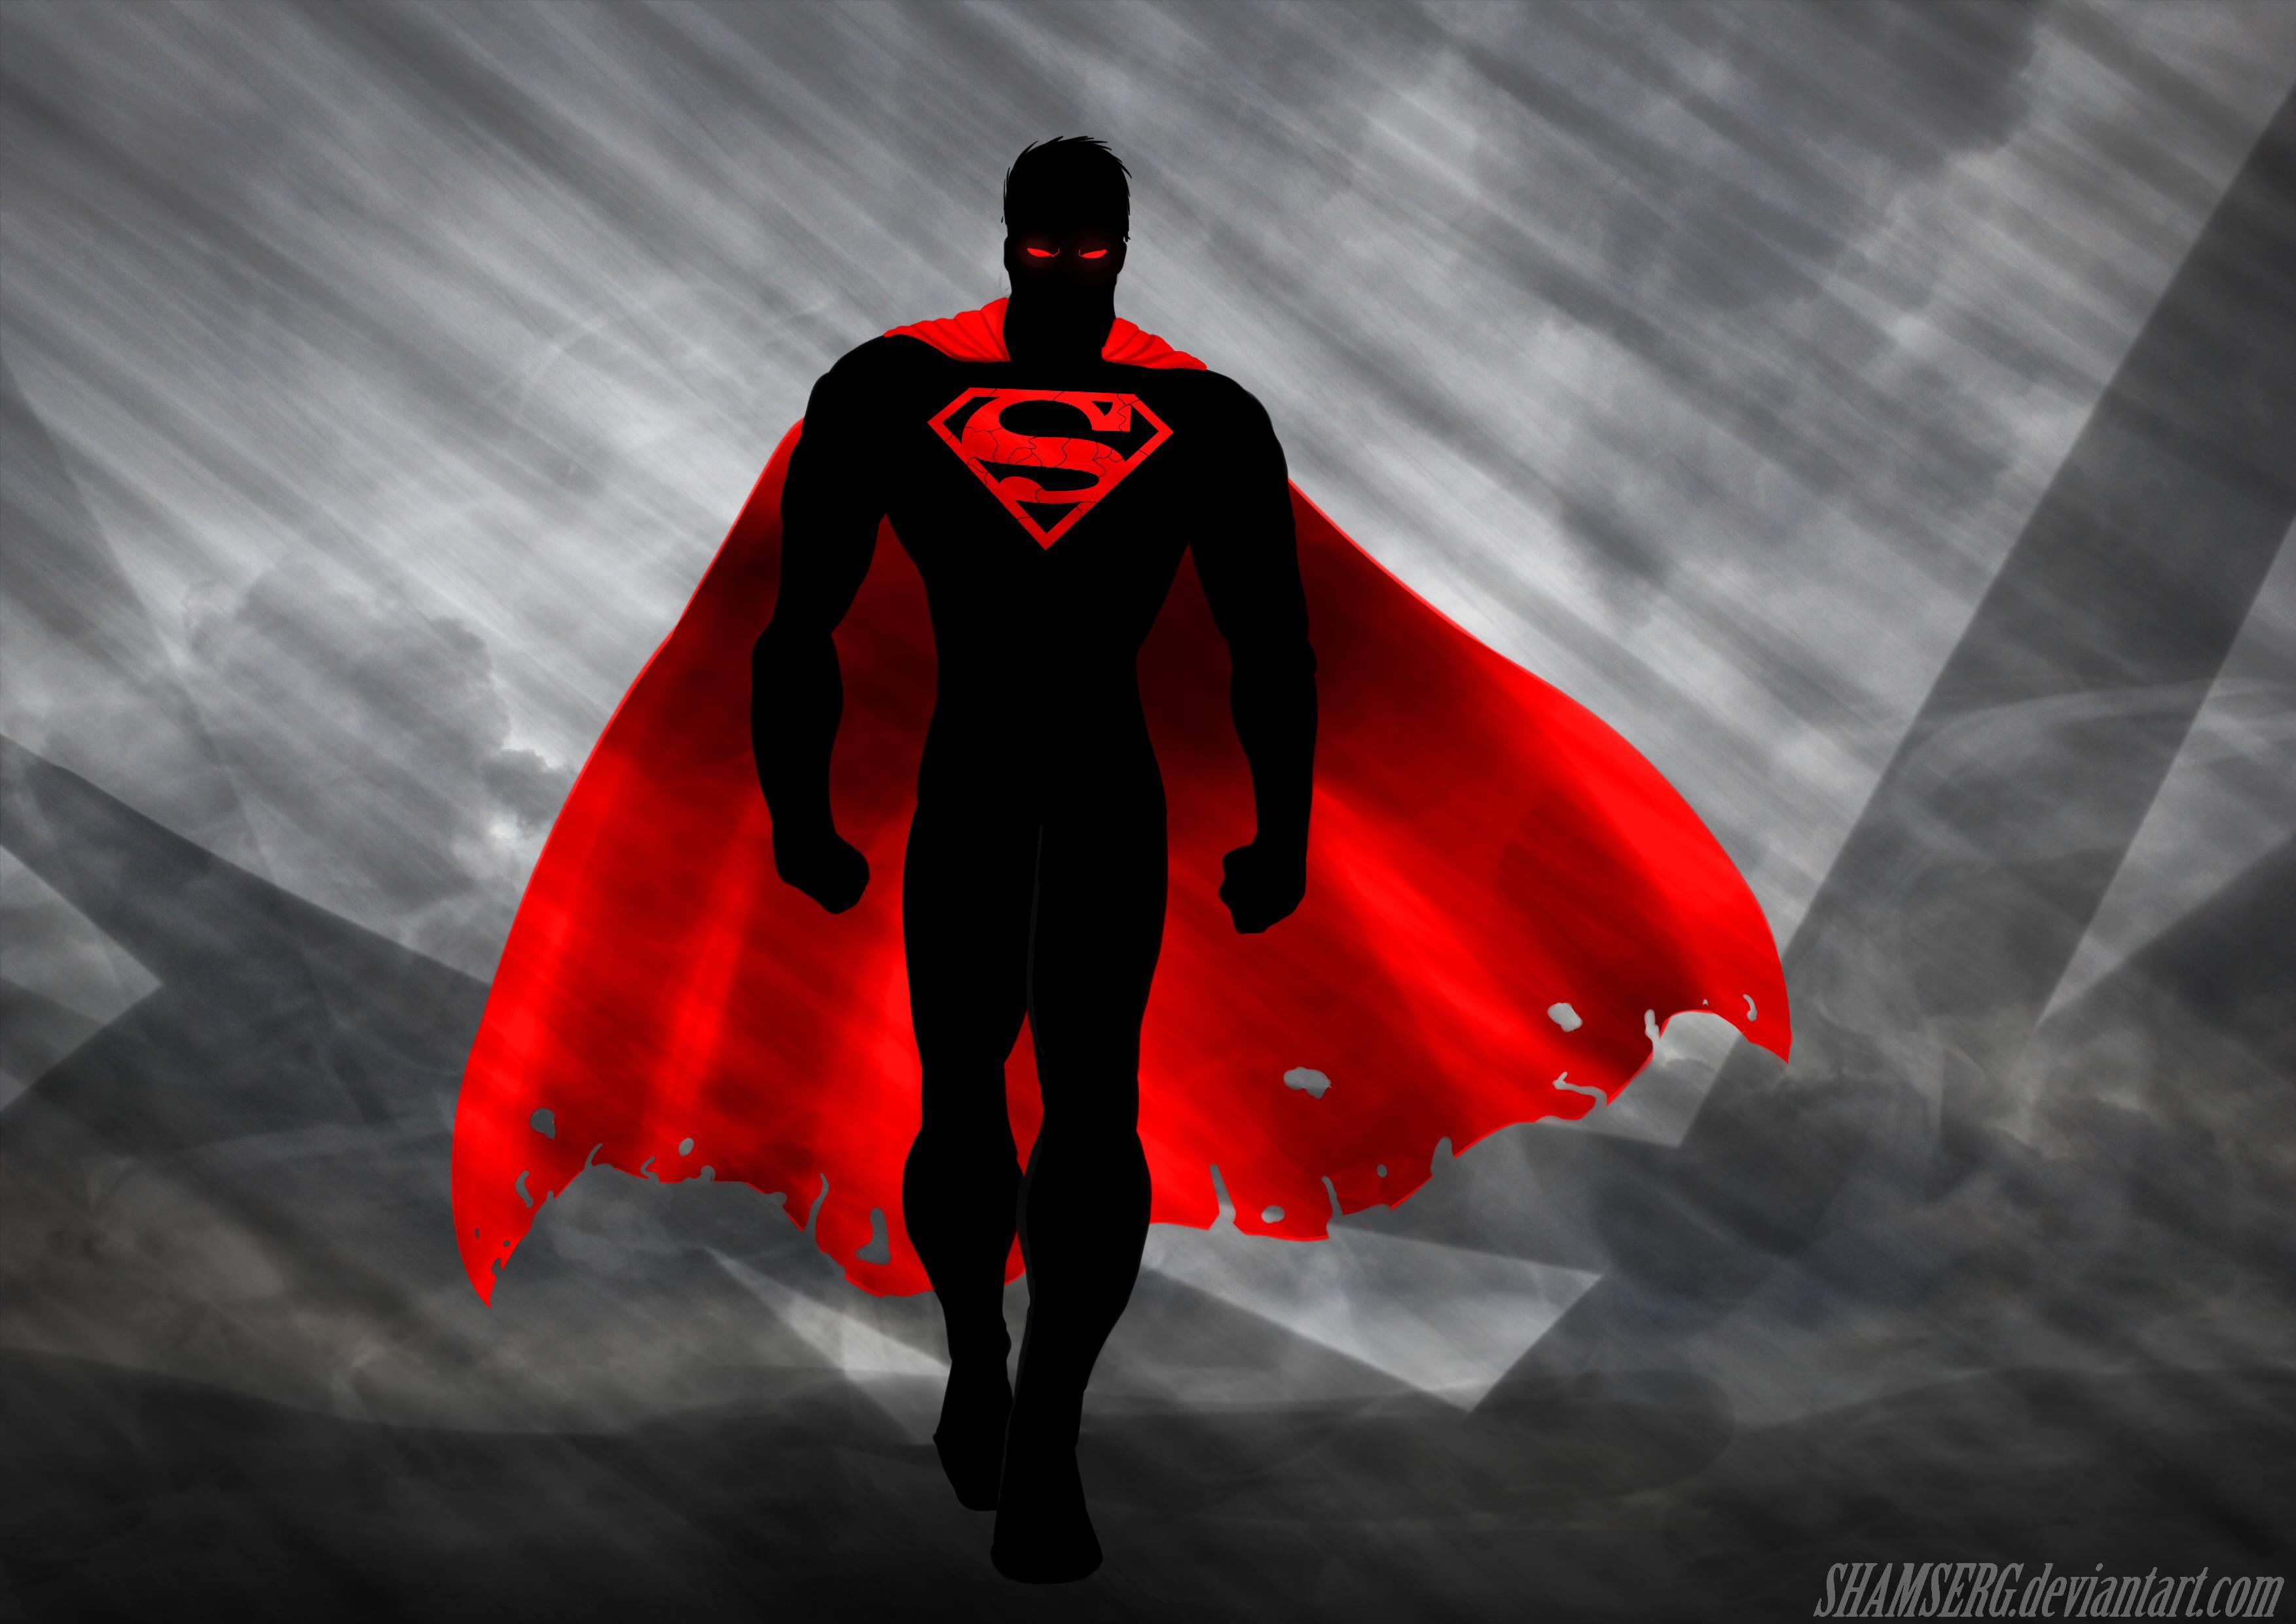 Wallpapers For Superman Man Of Steel Wallpaper Hd 1920x1080 3507x2480